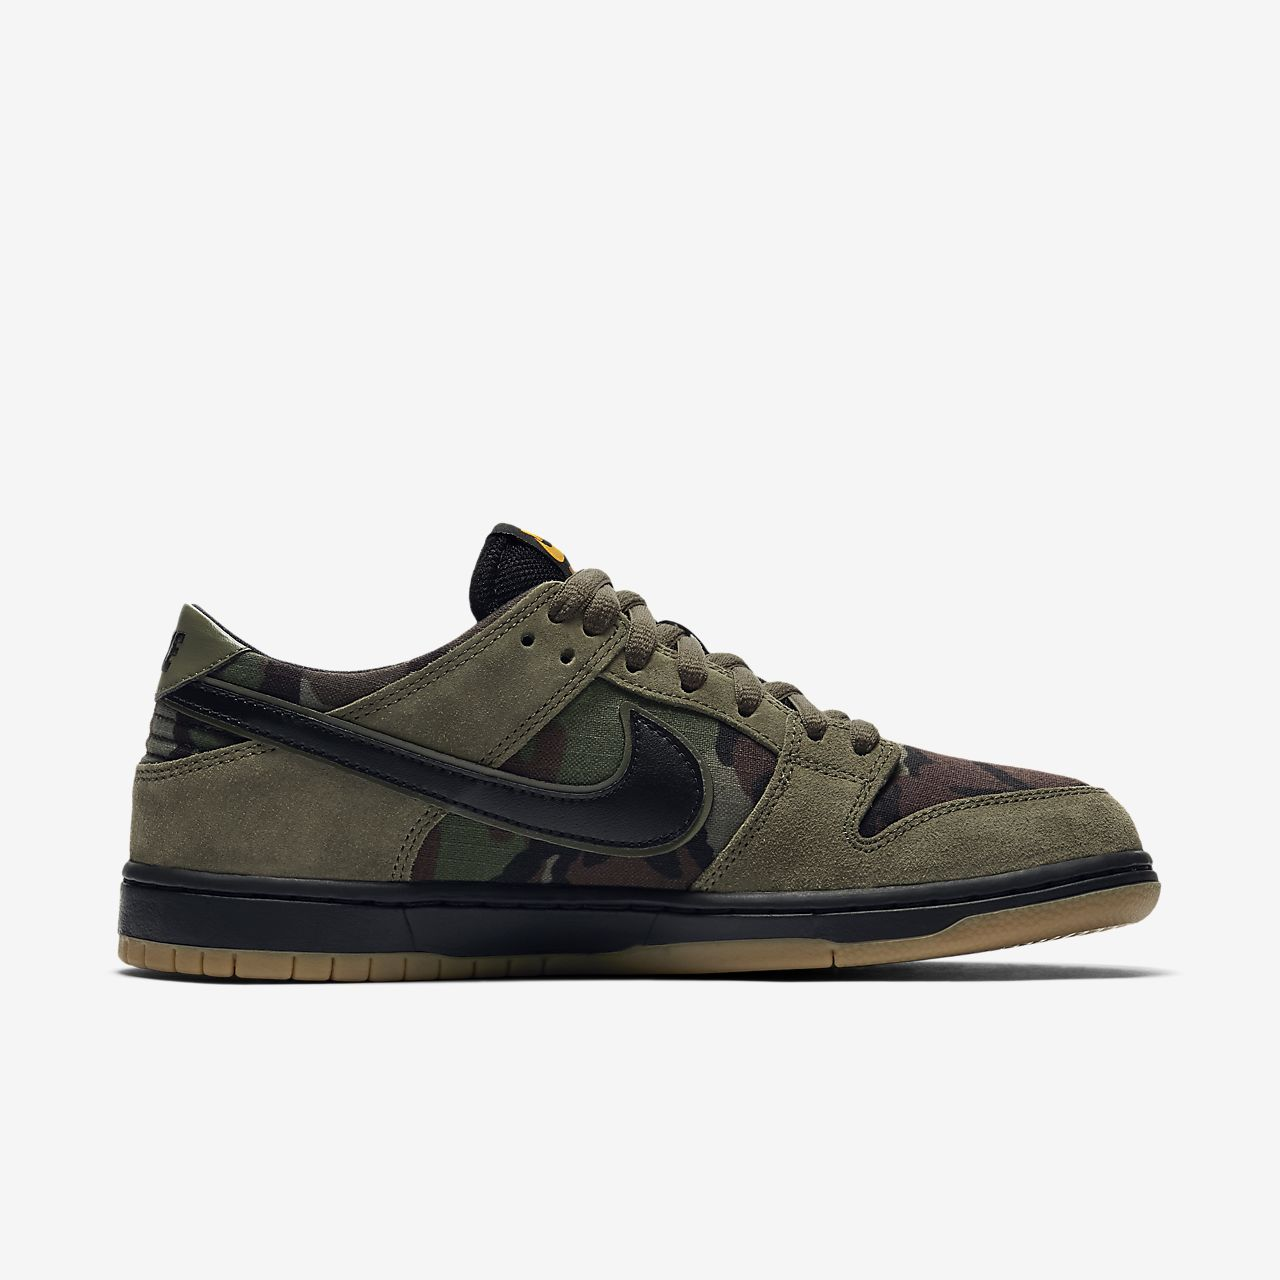 Buy Nike Sb Online Australia